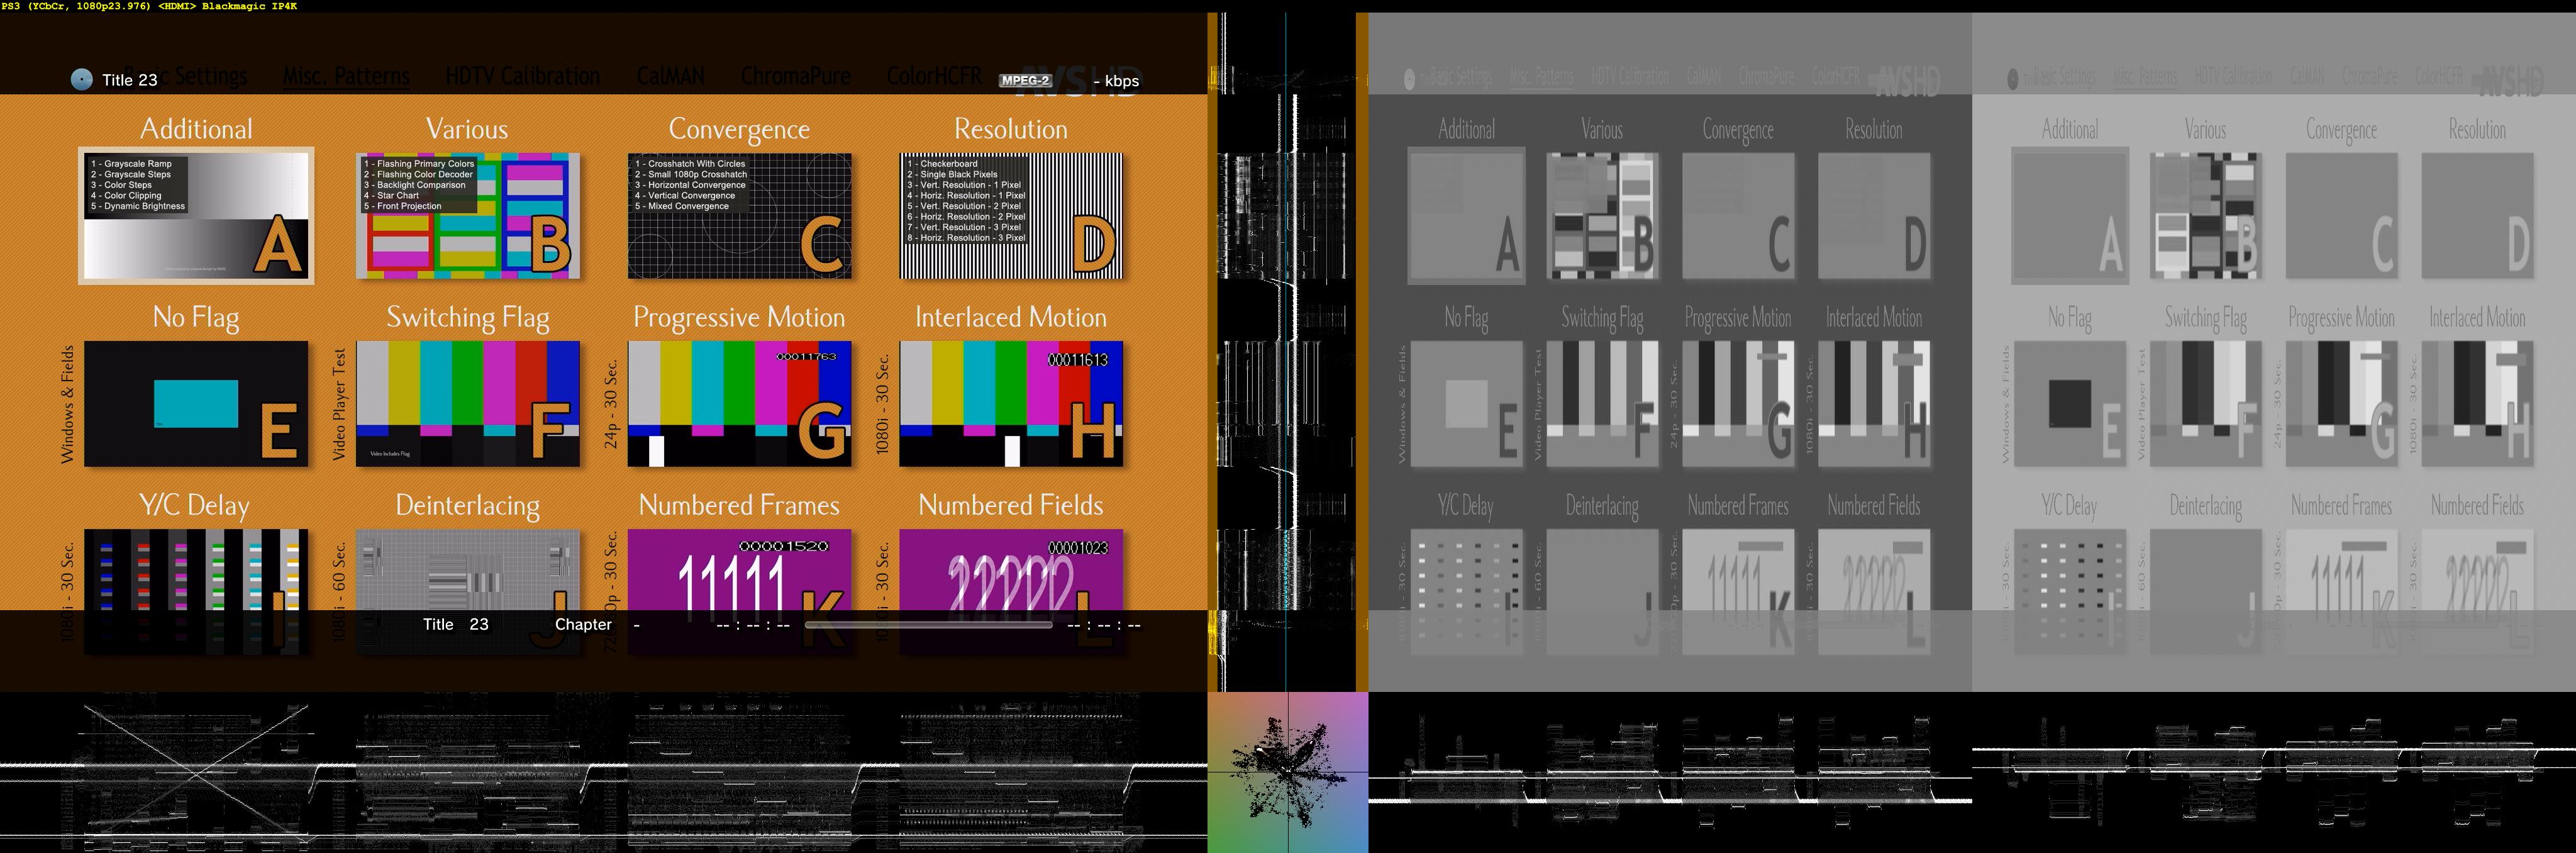 Click image for larger version  Name:AVS HD 709 BD menu - PS3, YCbCr =HDMI= IP4K.png Views:3676 Size:2.11 MB ID:35269